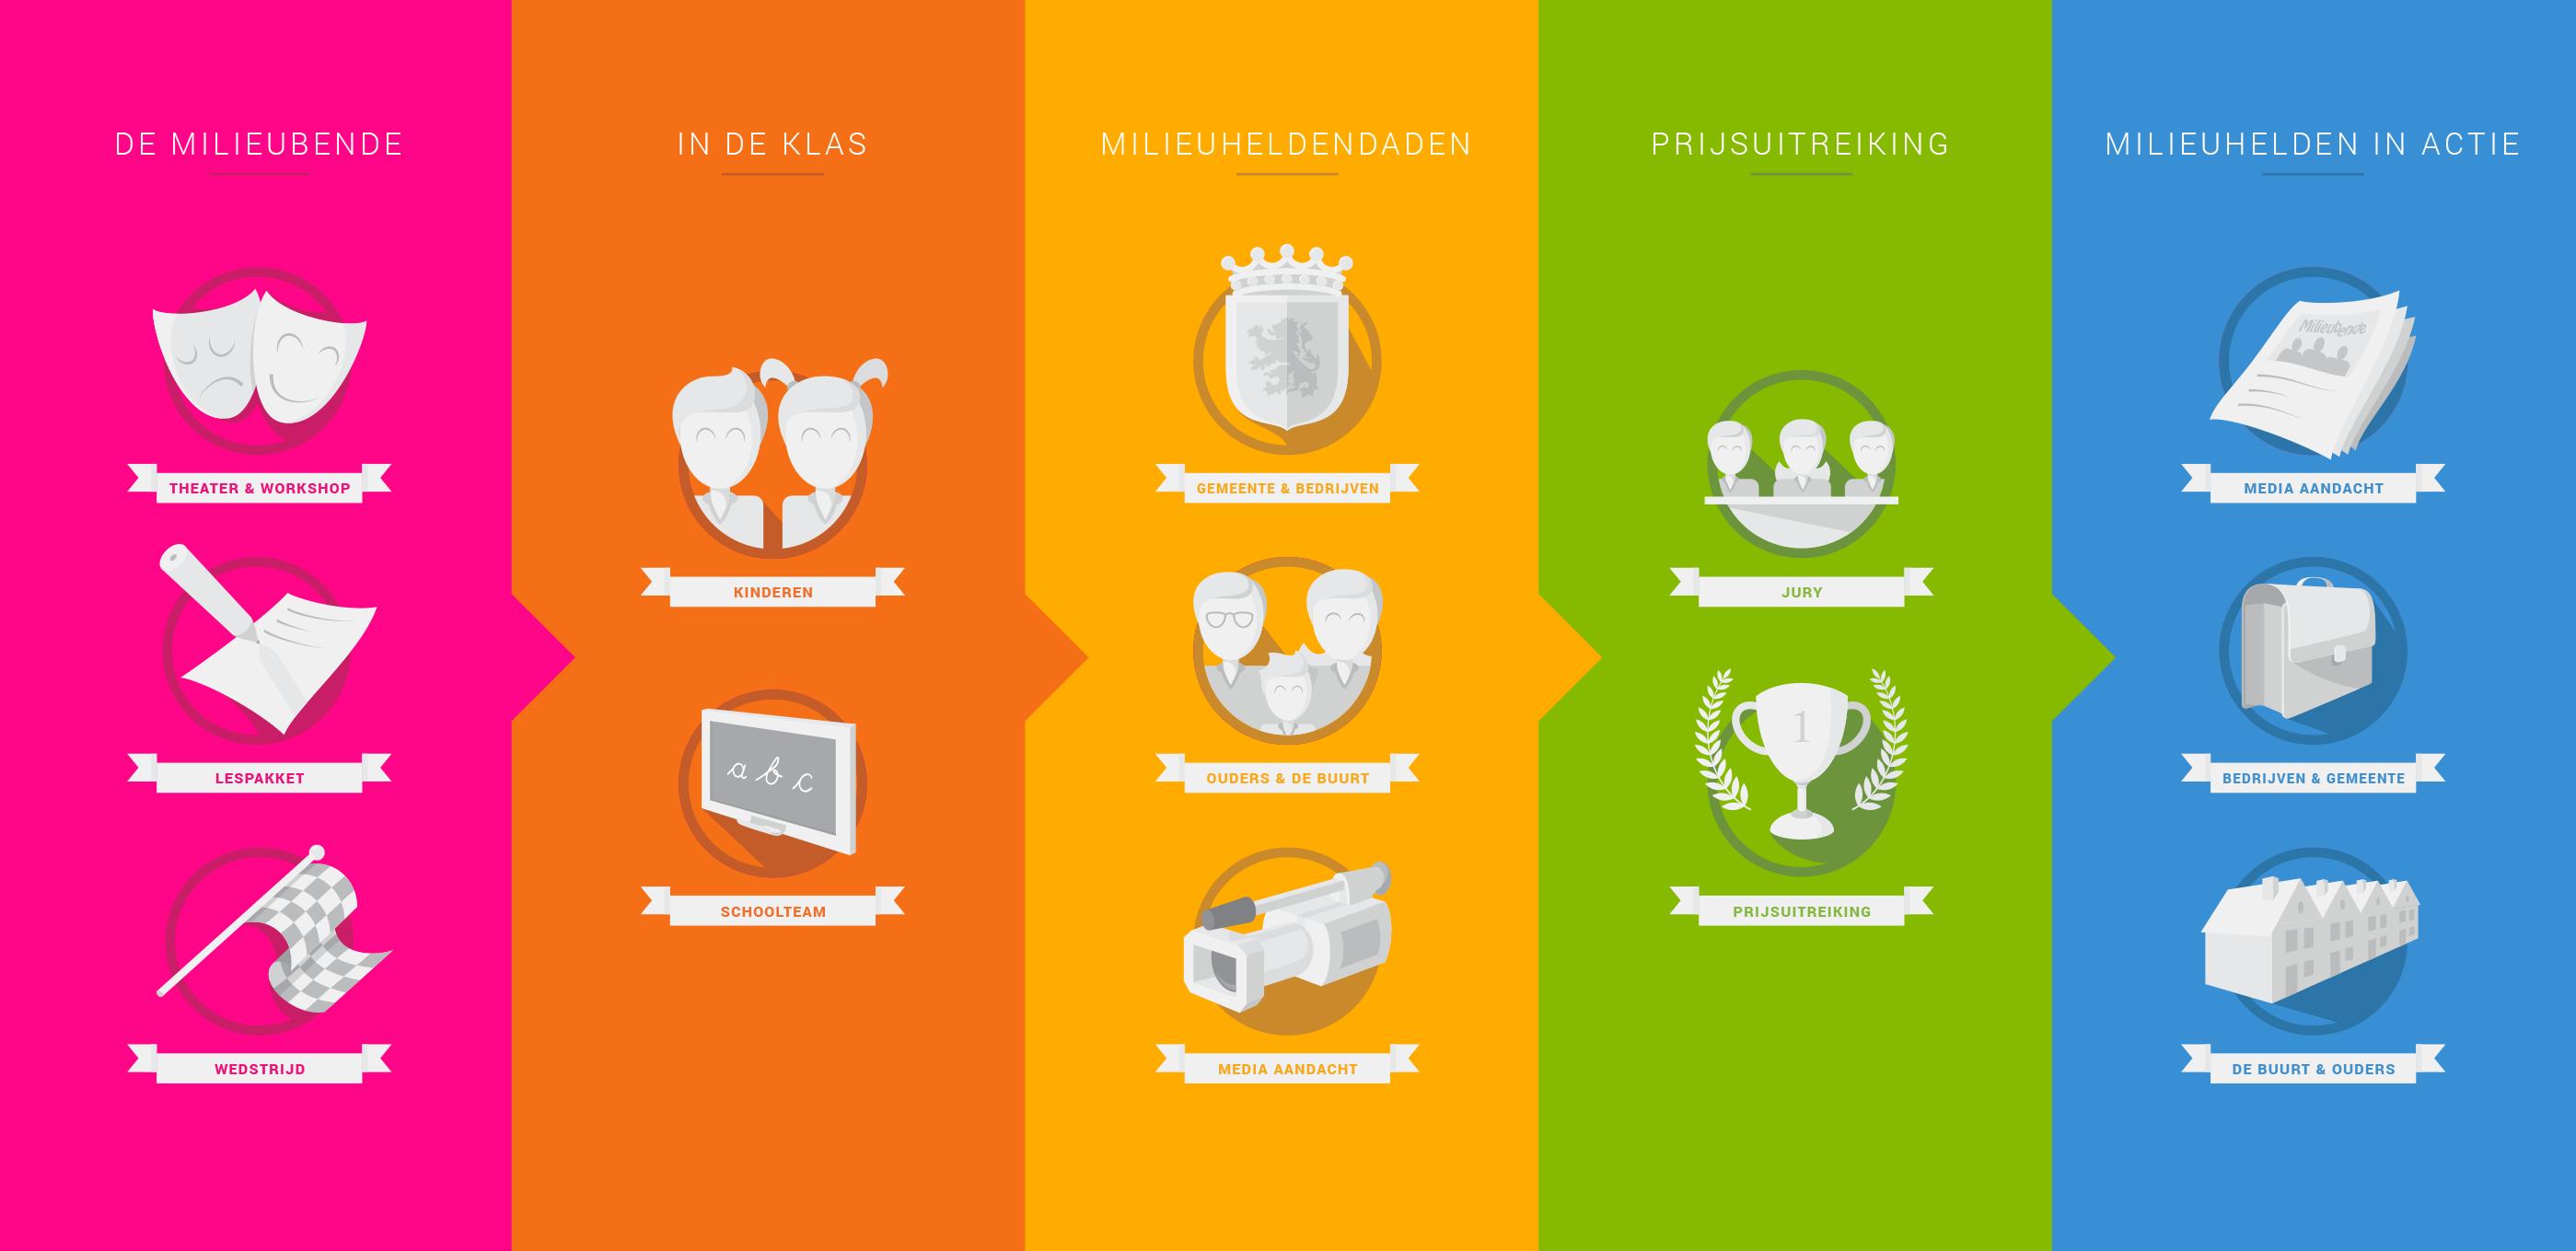 infographic-milieubende-drwoe-haarlem